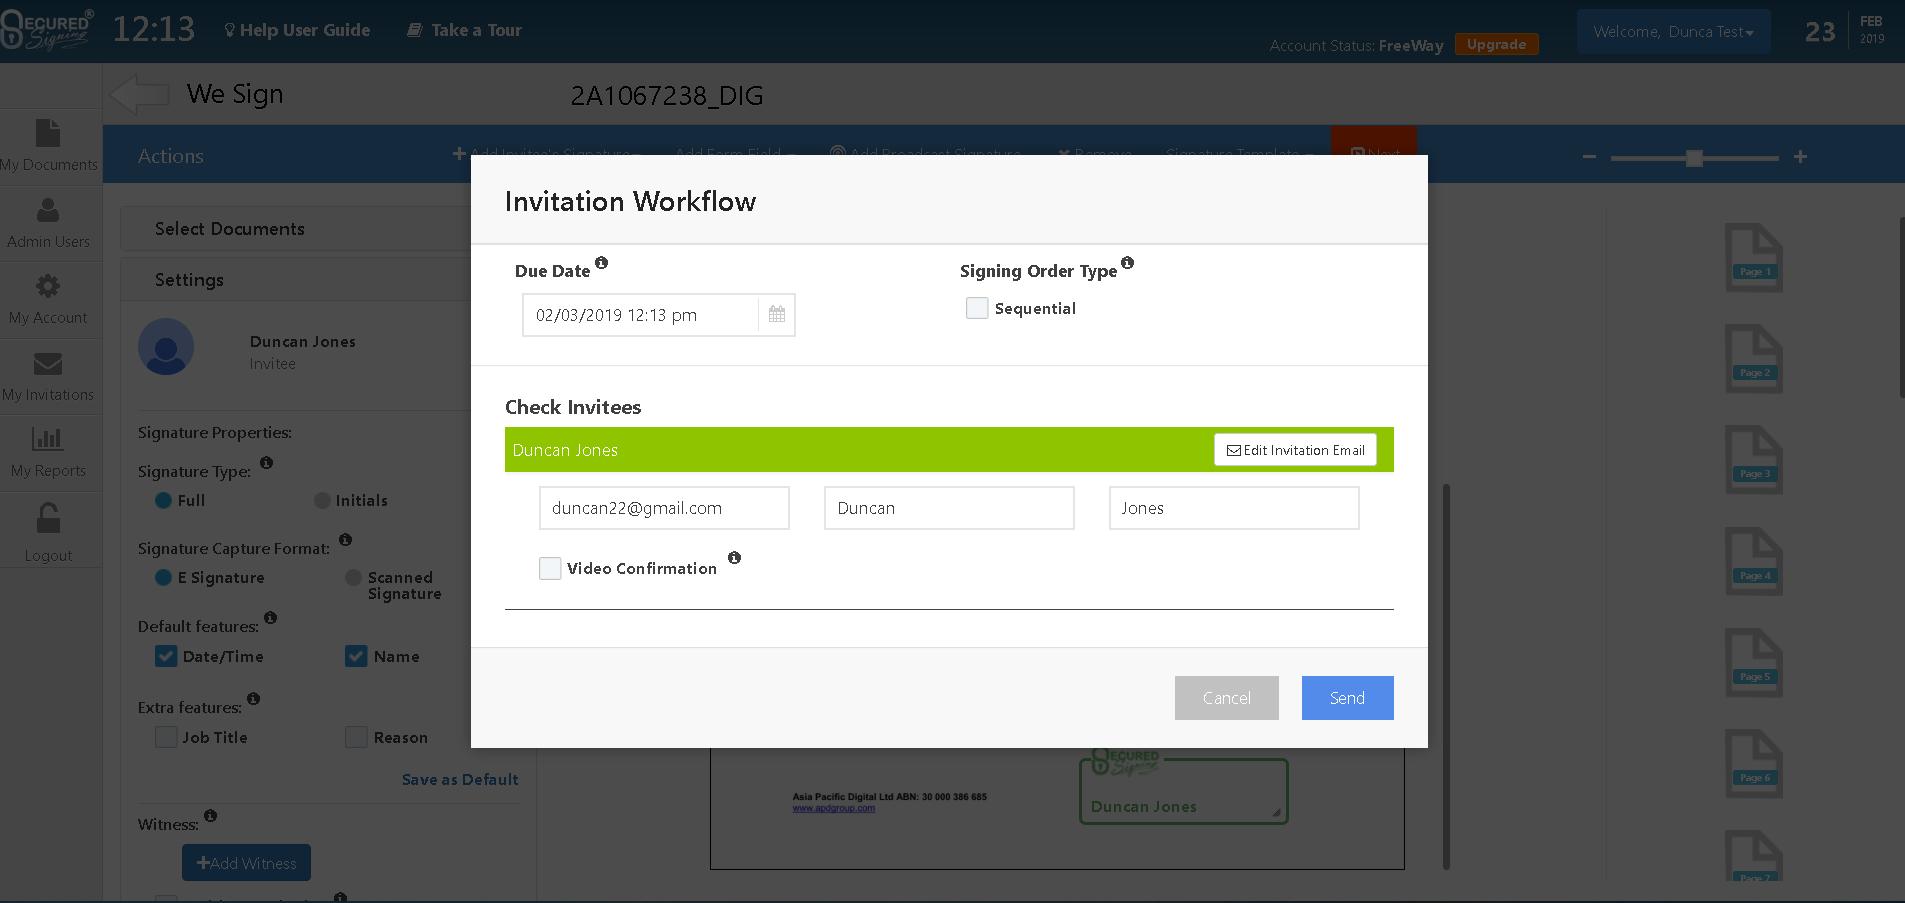 Invitation workflow